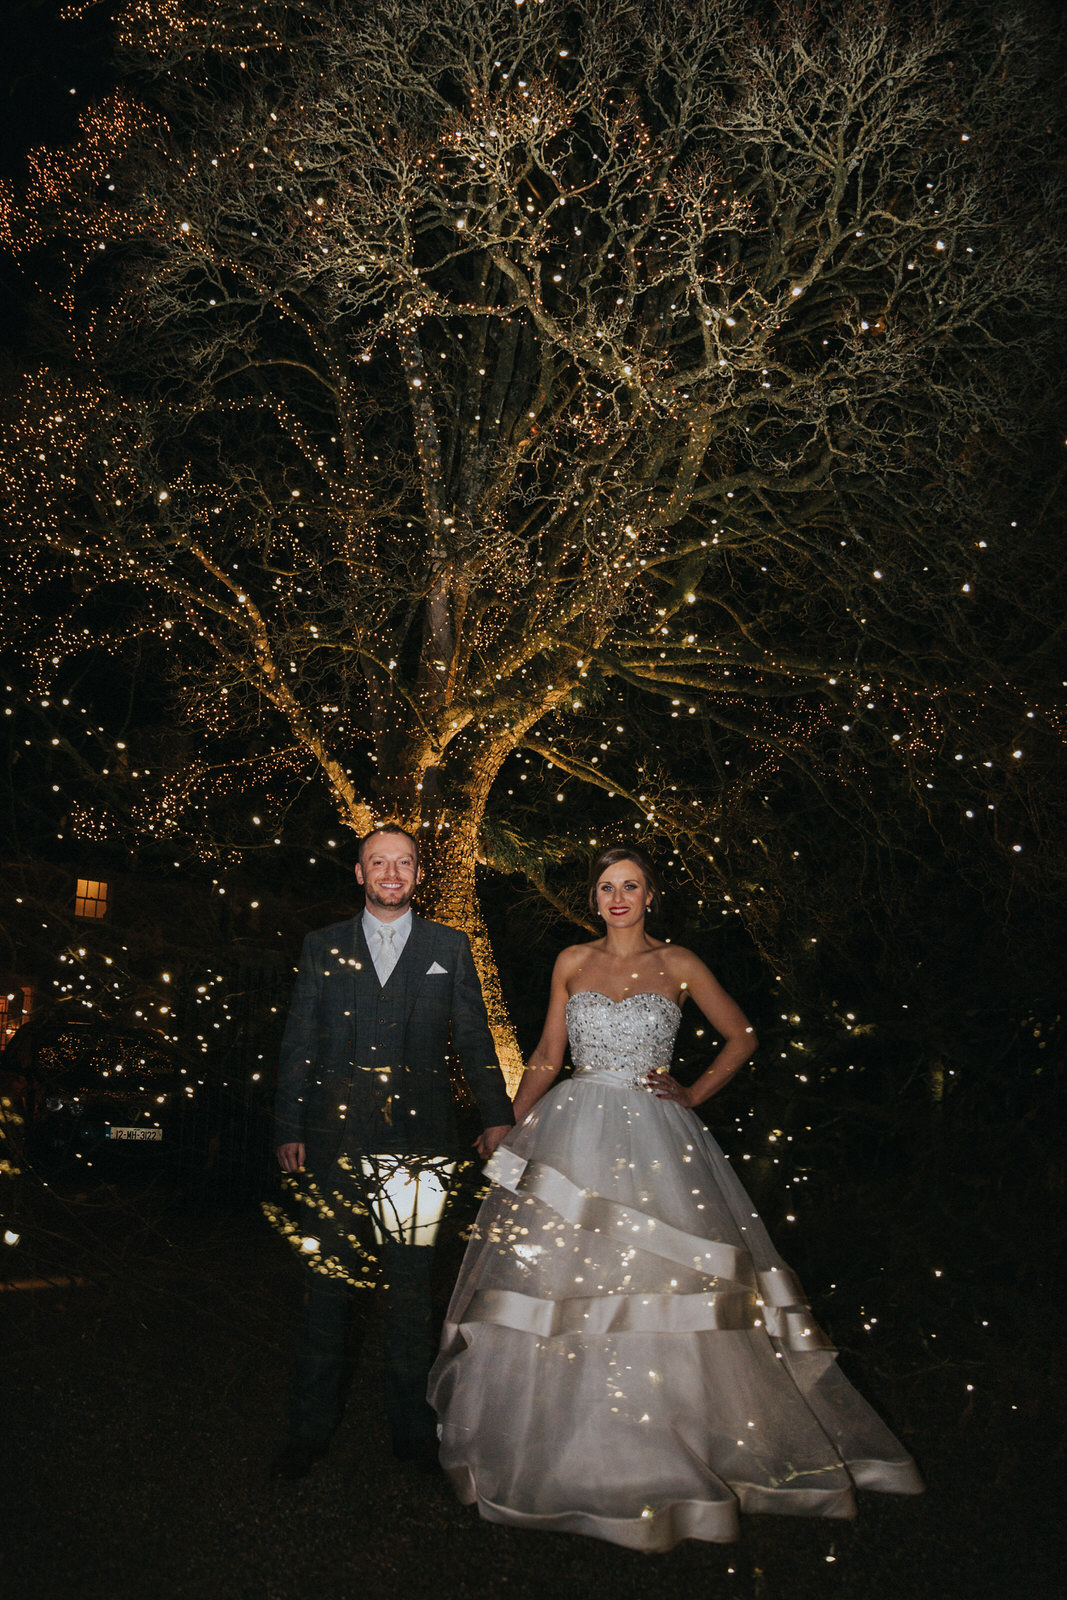 Clonabreany_wedding-photographer_roger_kenny_ireland_114.jpg